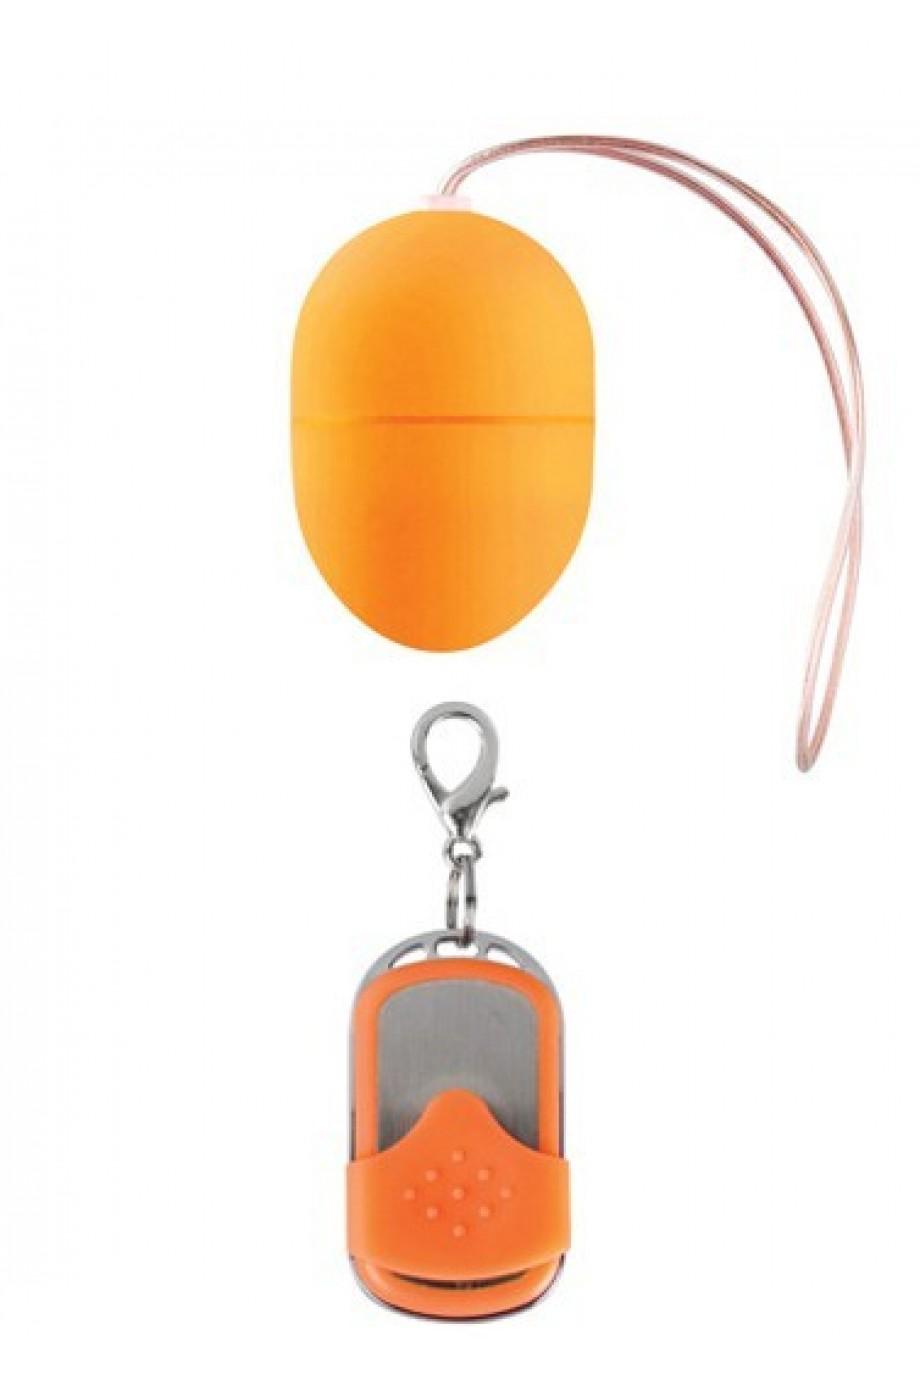 Виброяйцо 10 Speed Remote Vibrating Egg Small оранжевое